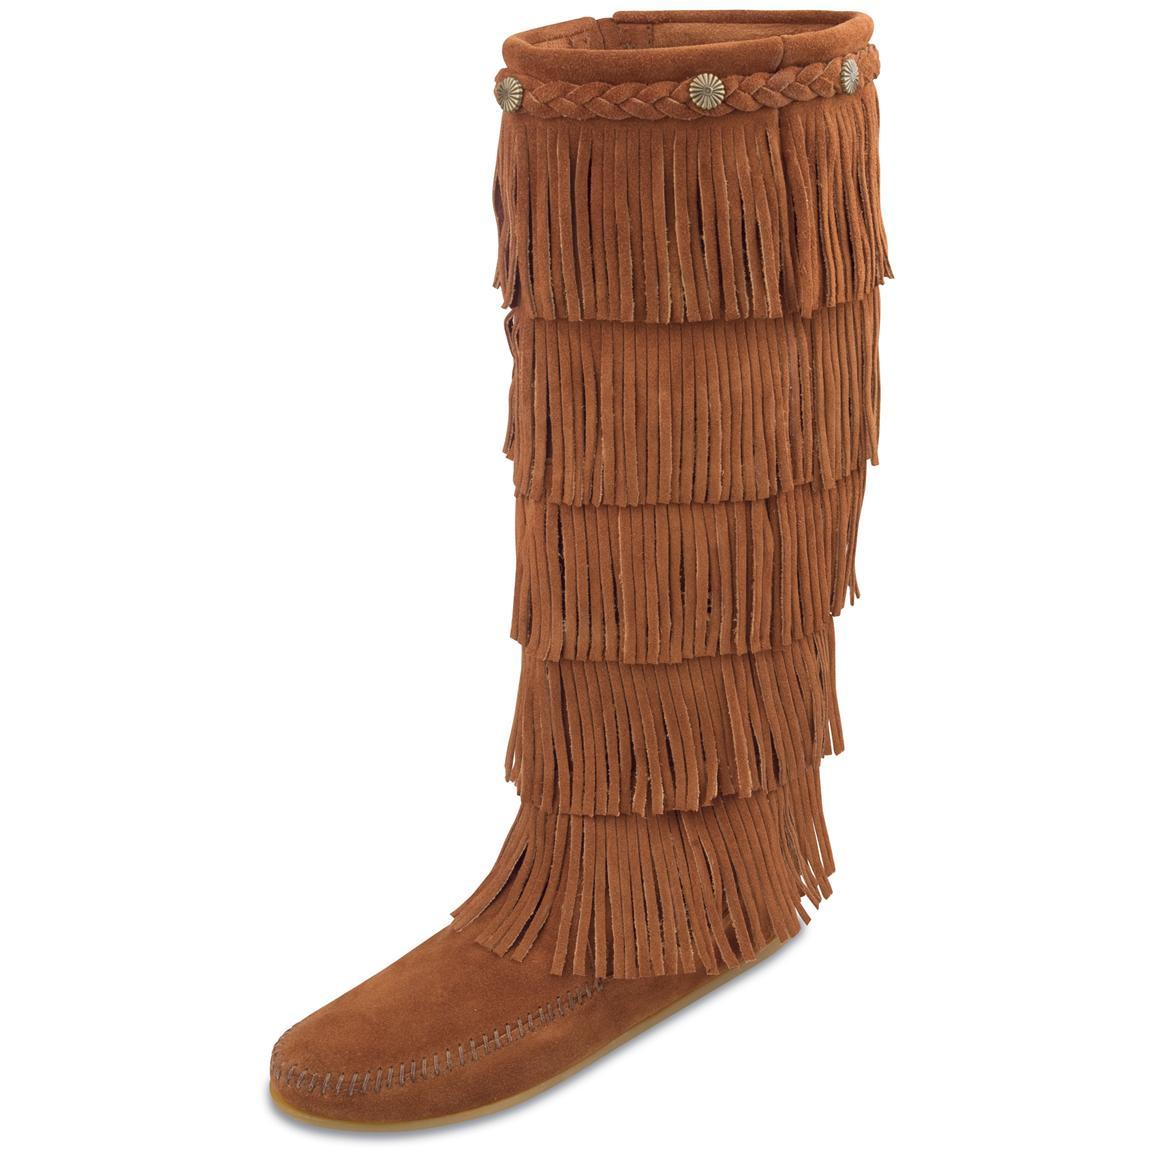 discount minnetonka fringe bootsWomens Minnetonka Moc   5   Layer Fringe Boots   164758 Casual 4lAWXDwL